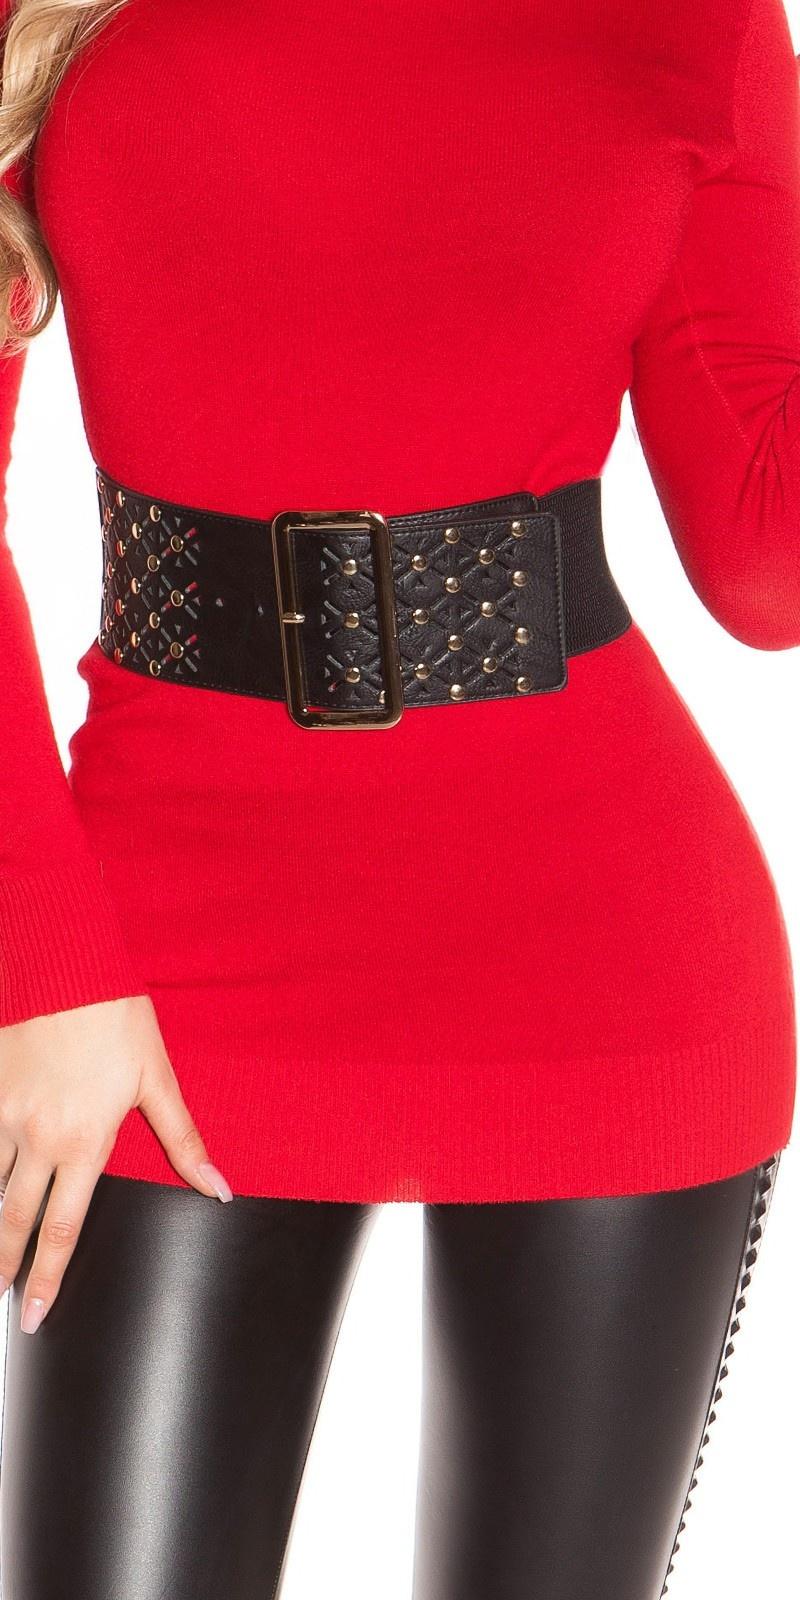 Sexy waist belt with studs Black